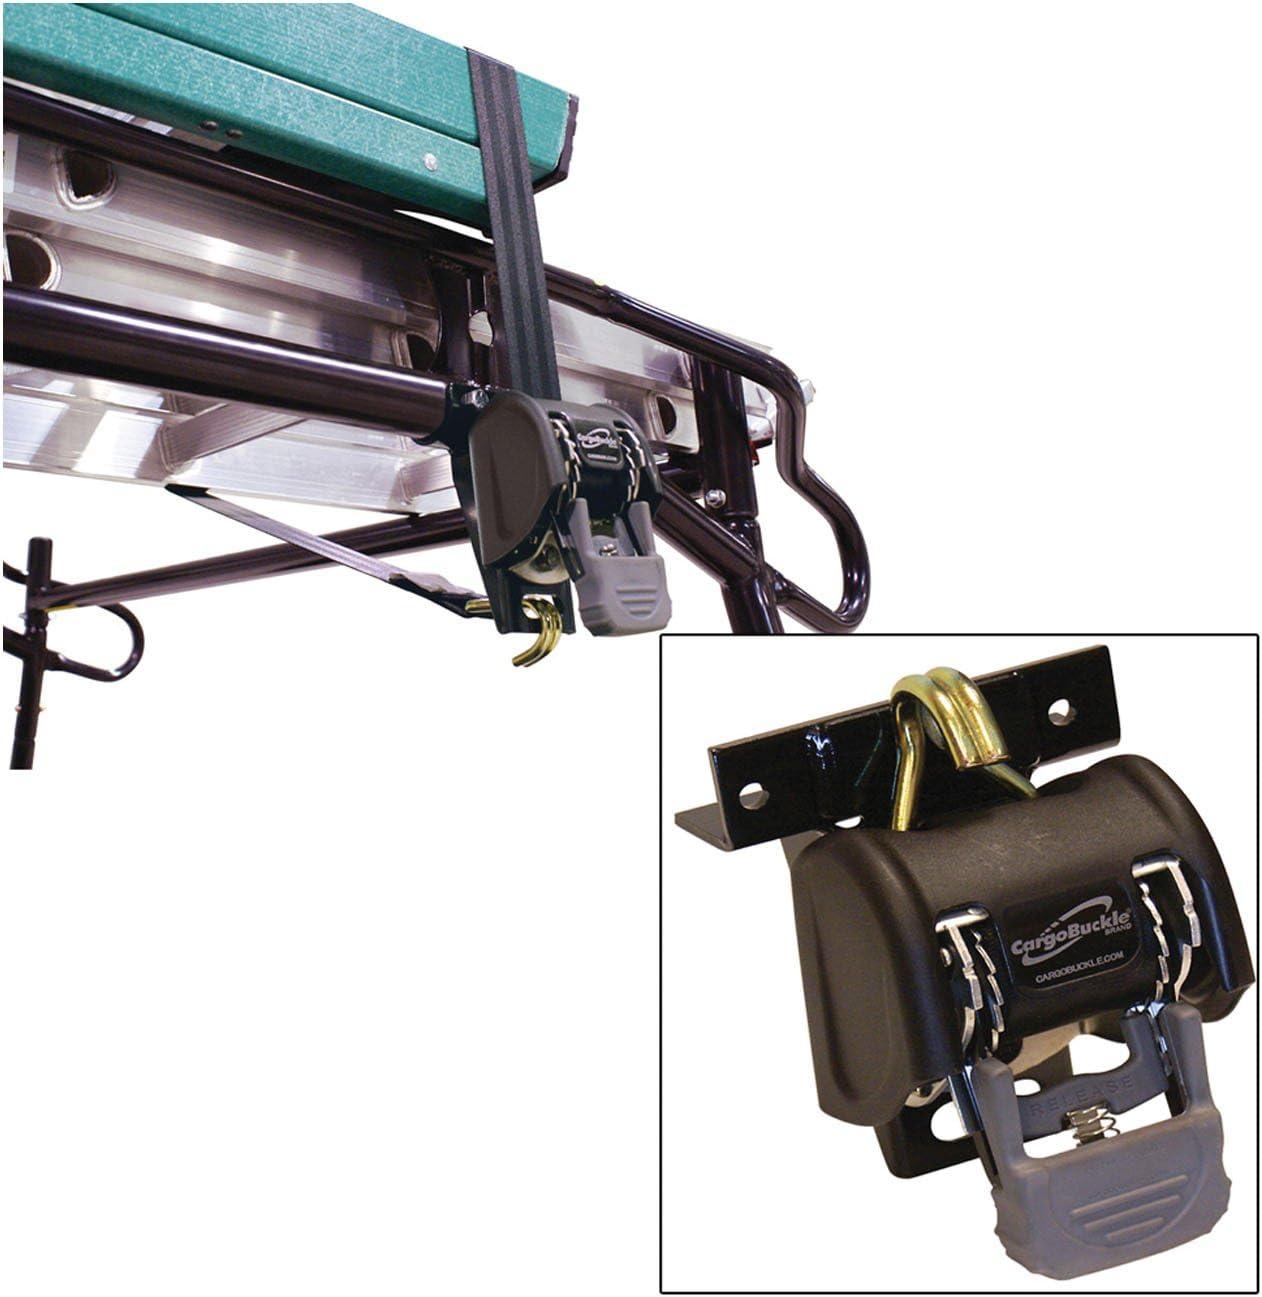 1.25 Square 7 Pair 40790 CargoBuckle Ladder Rack System